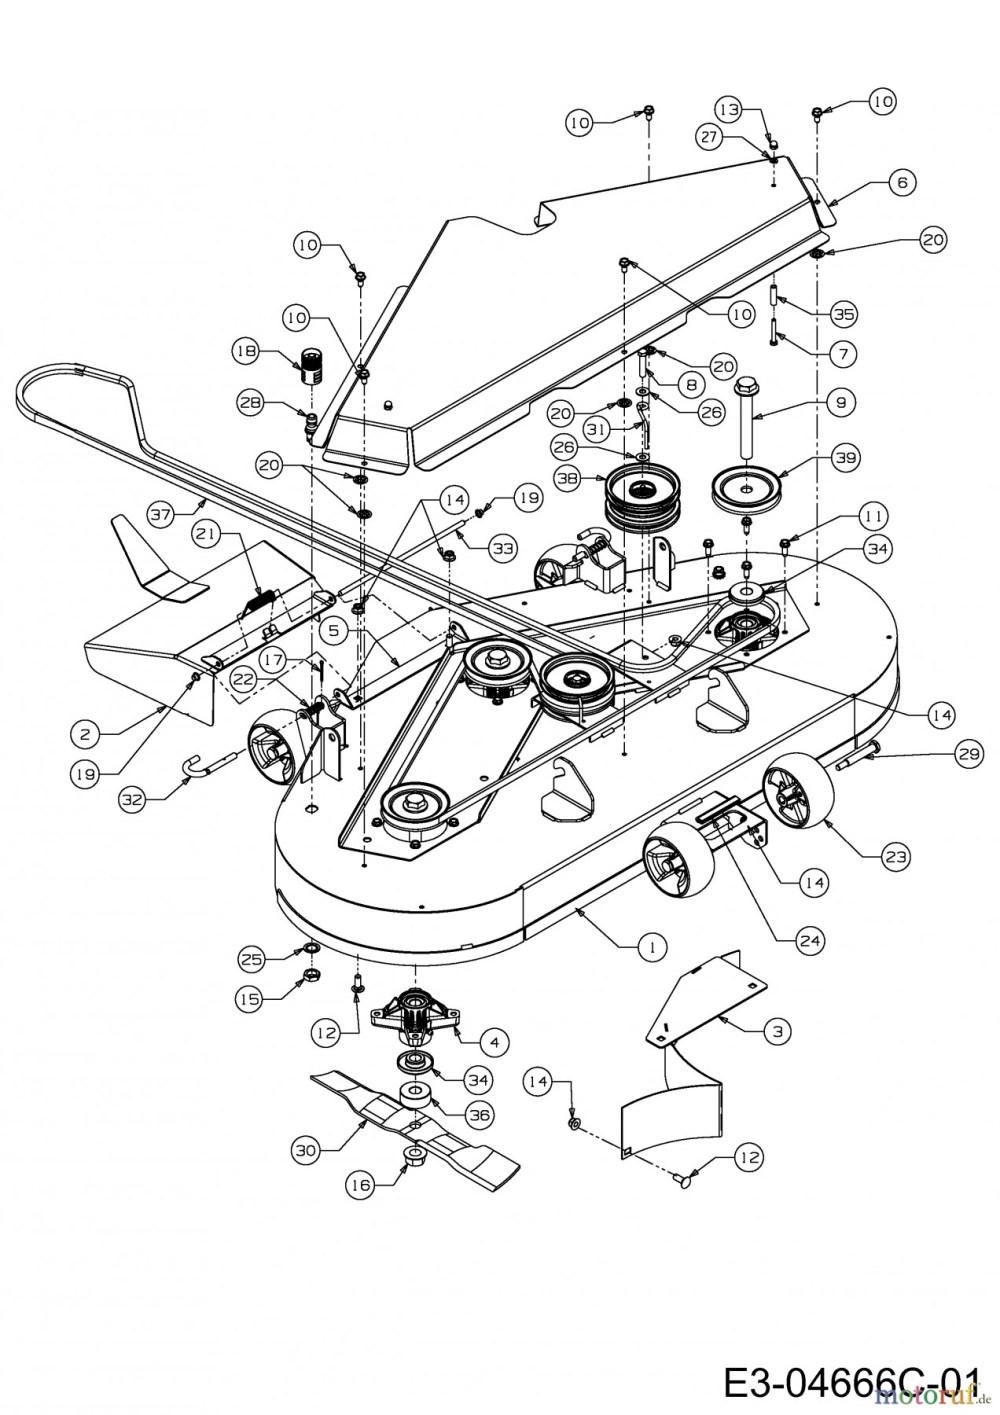 medium resolution of cub cadet zero turn parts diagram cub cadet zero turn fmz 48 17bi4bfy603 2011 mowing deck